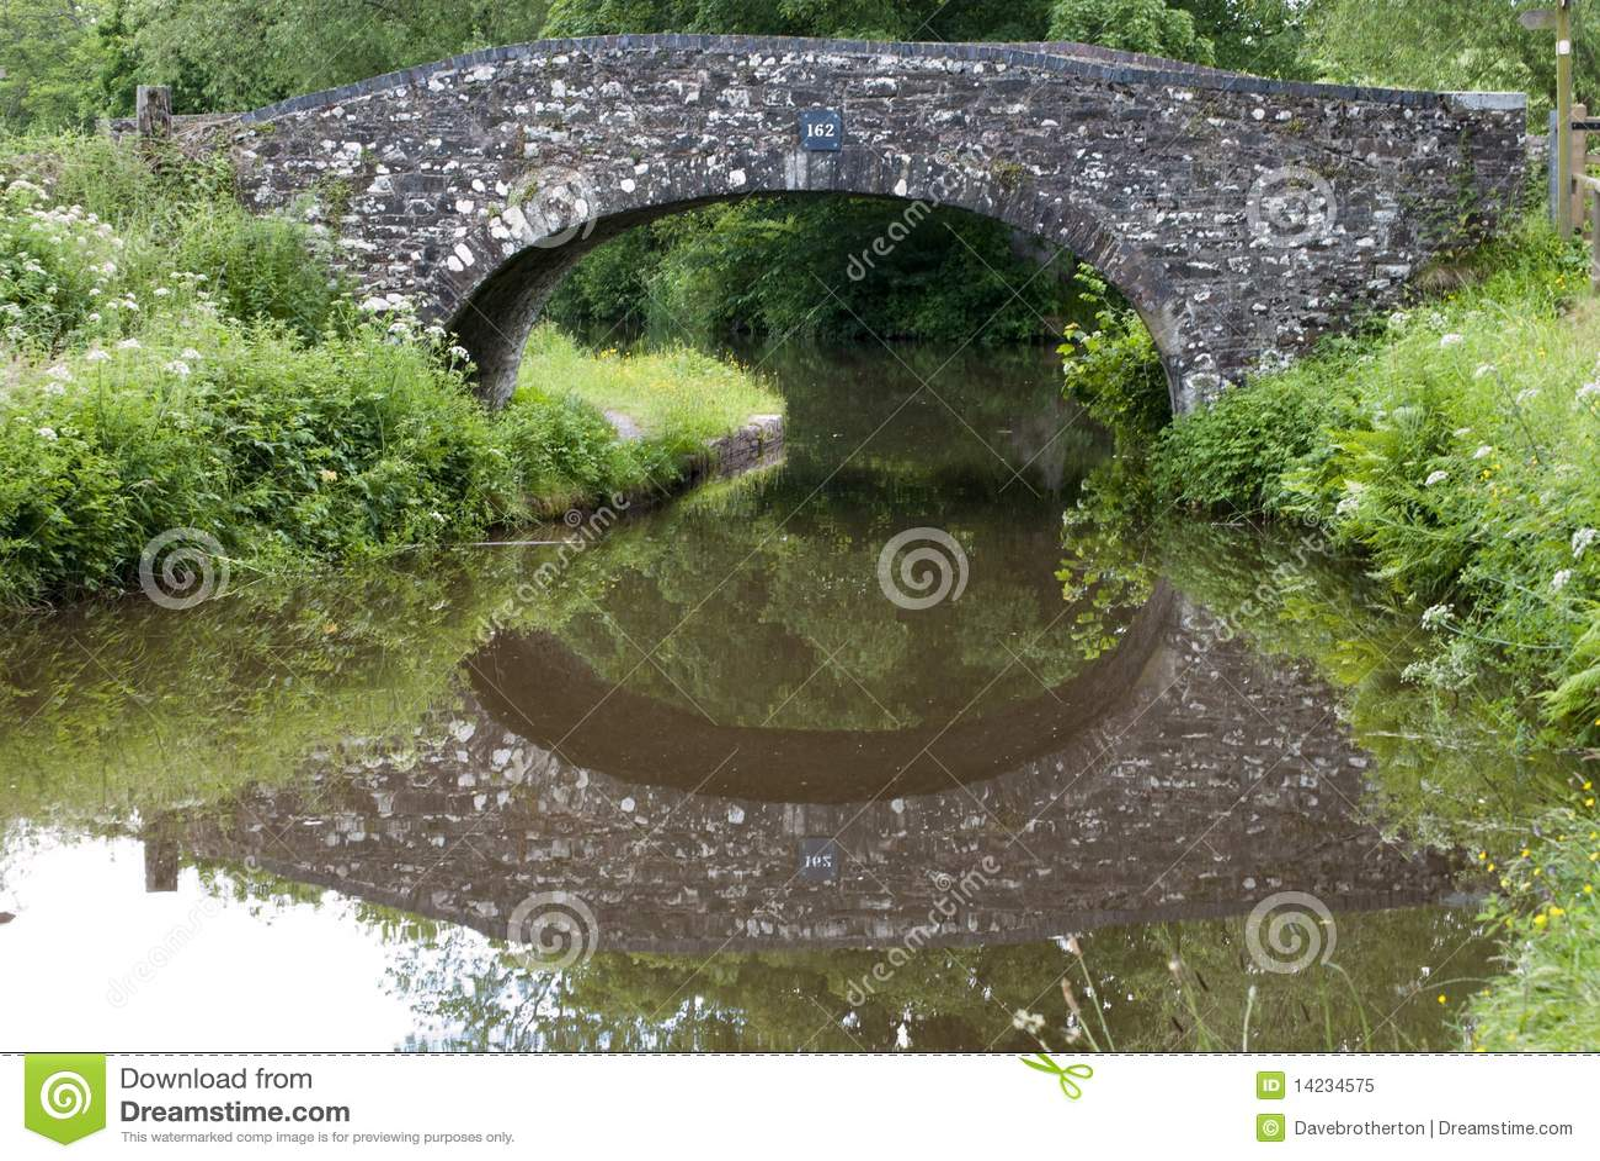 канал моста